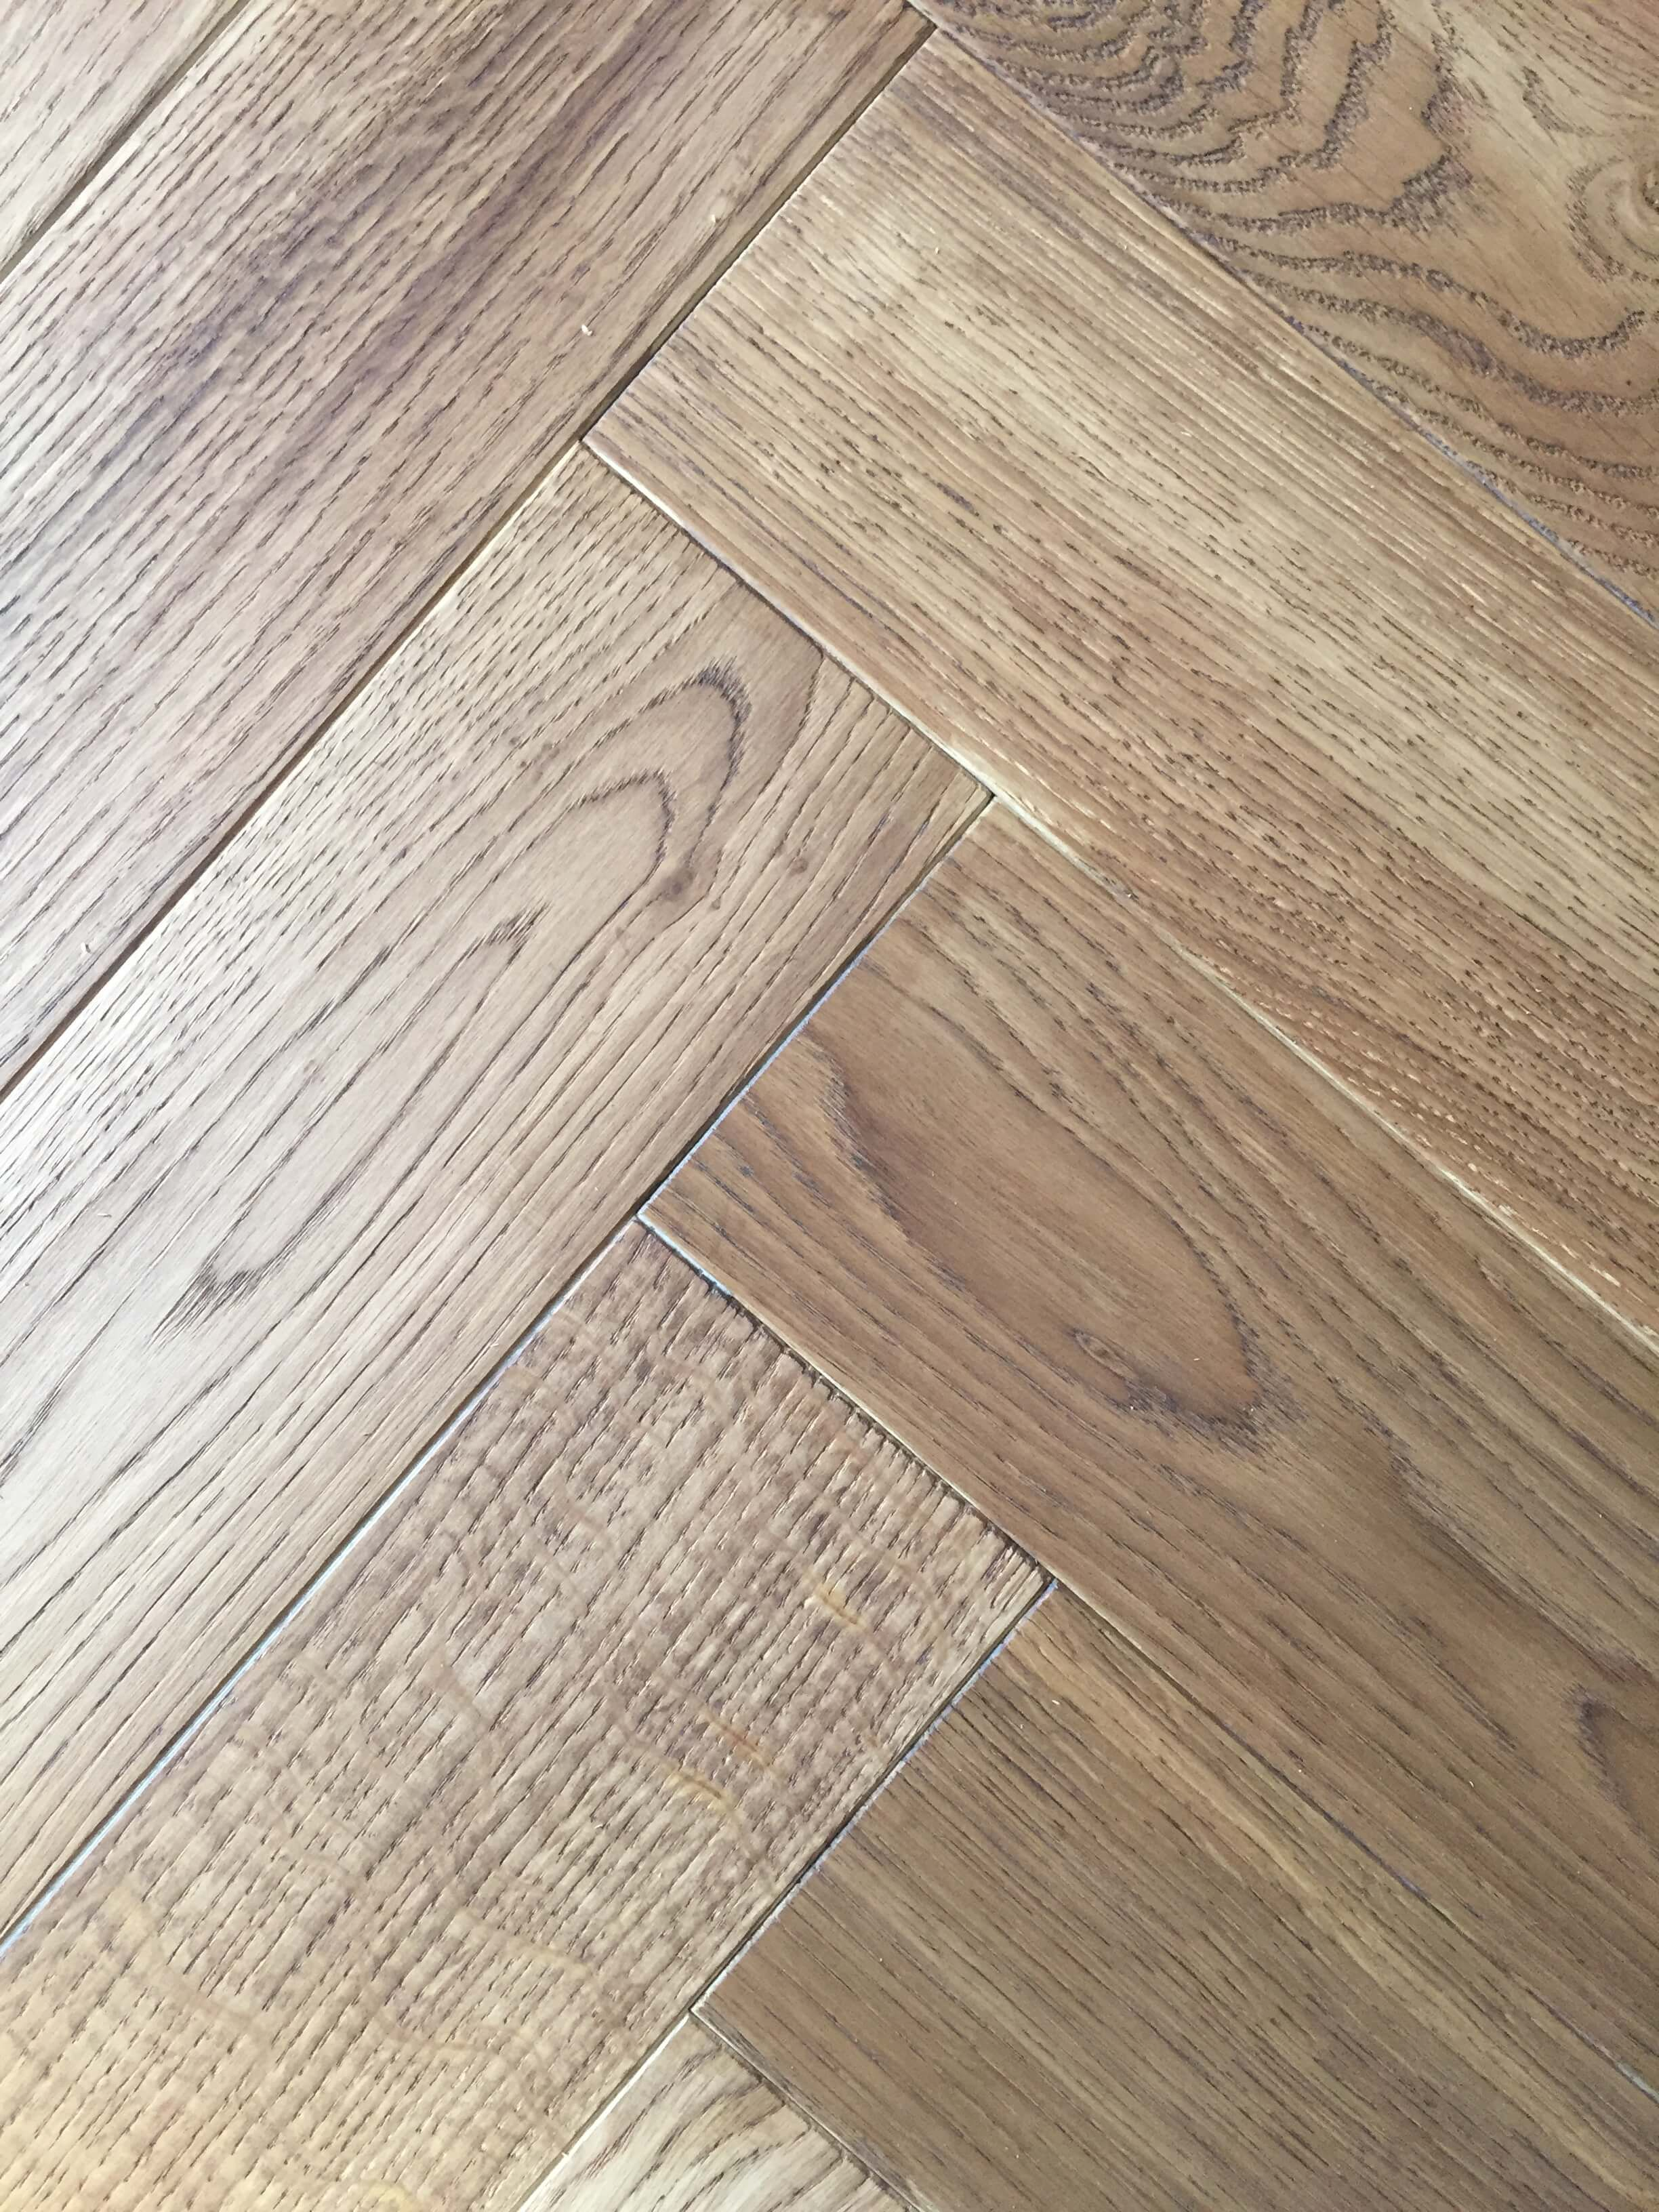 Home Depot Engineered Wood Flooring